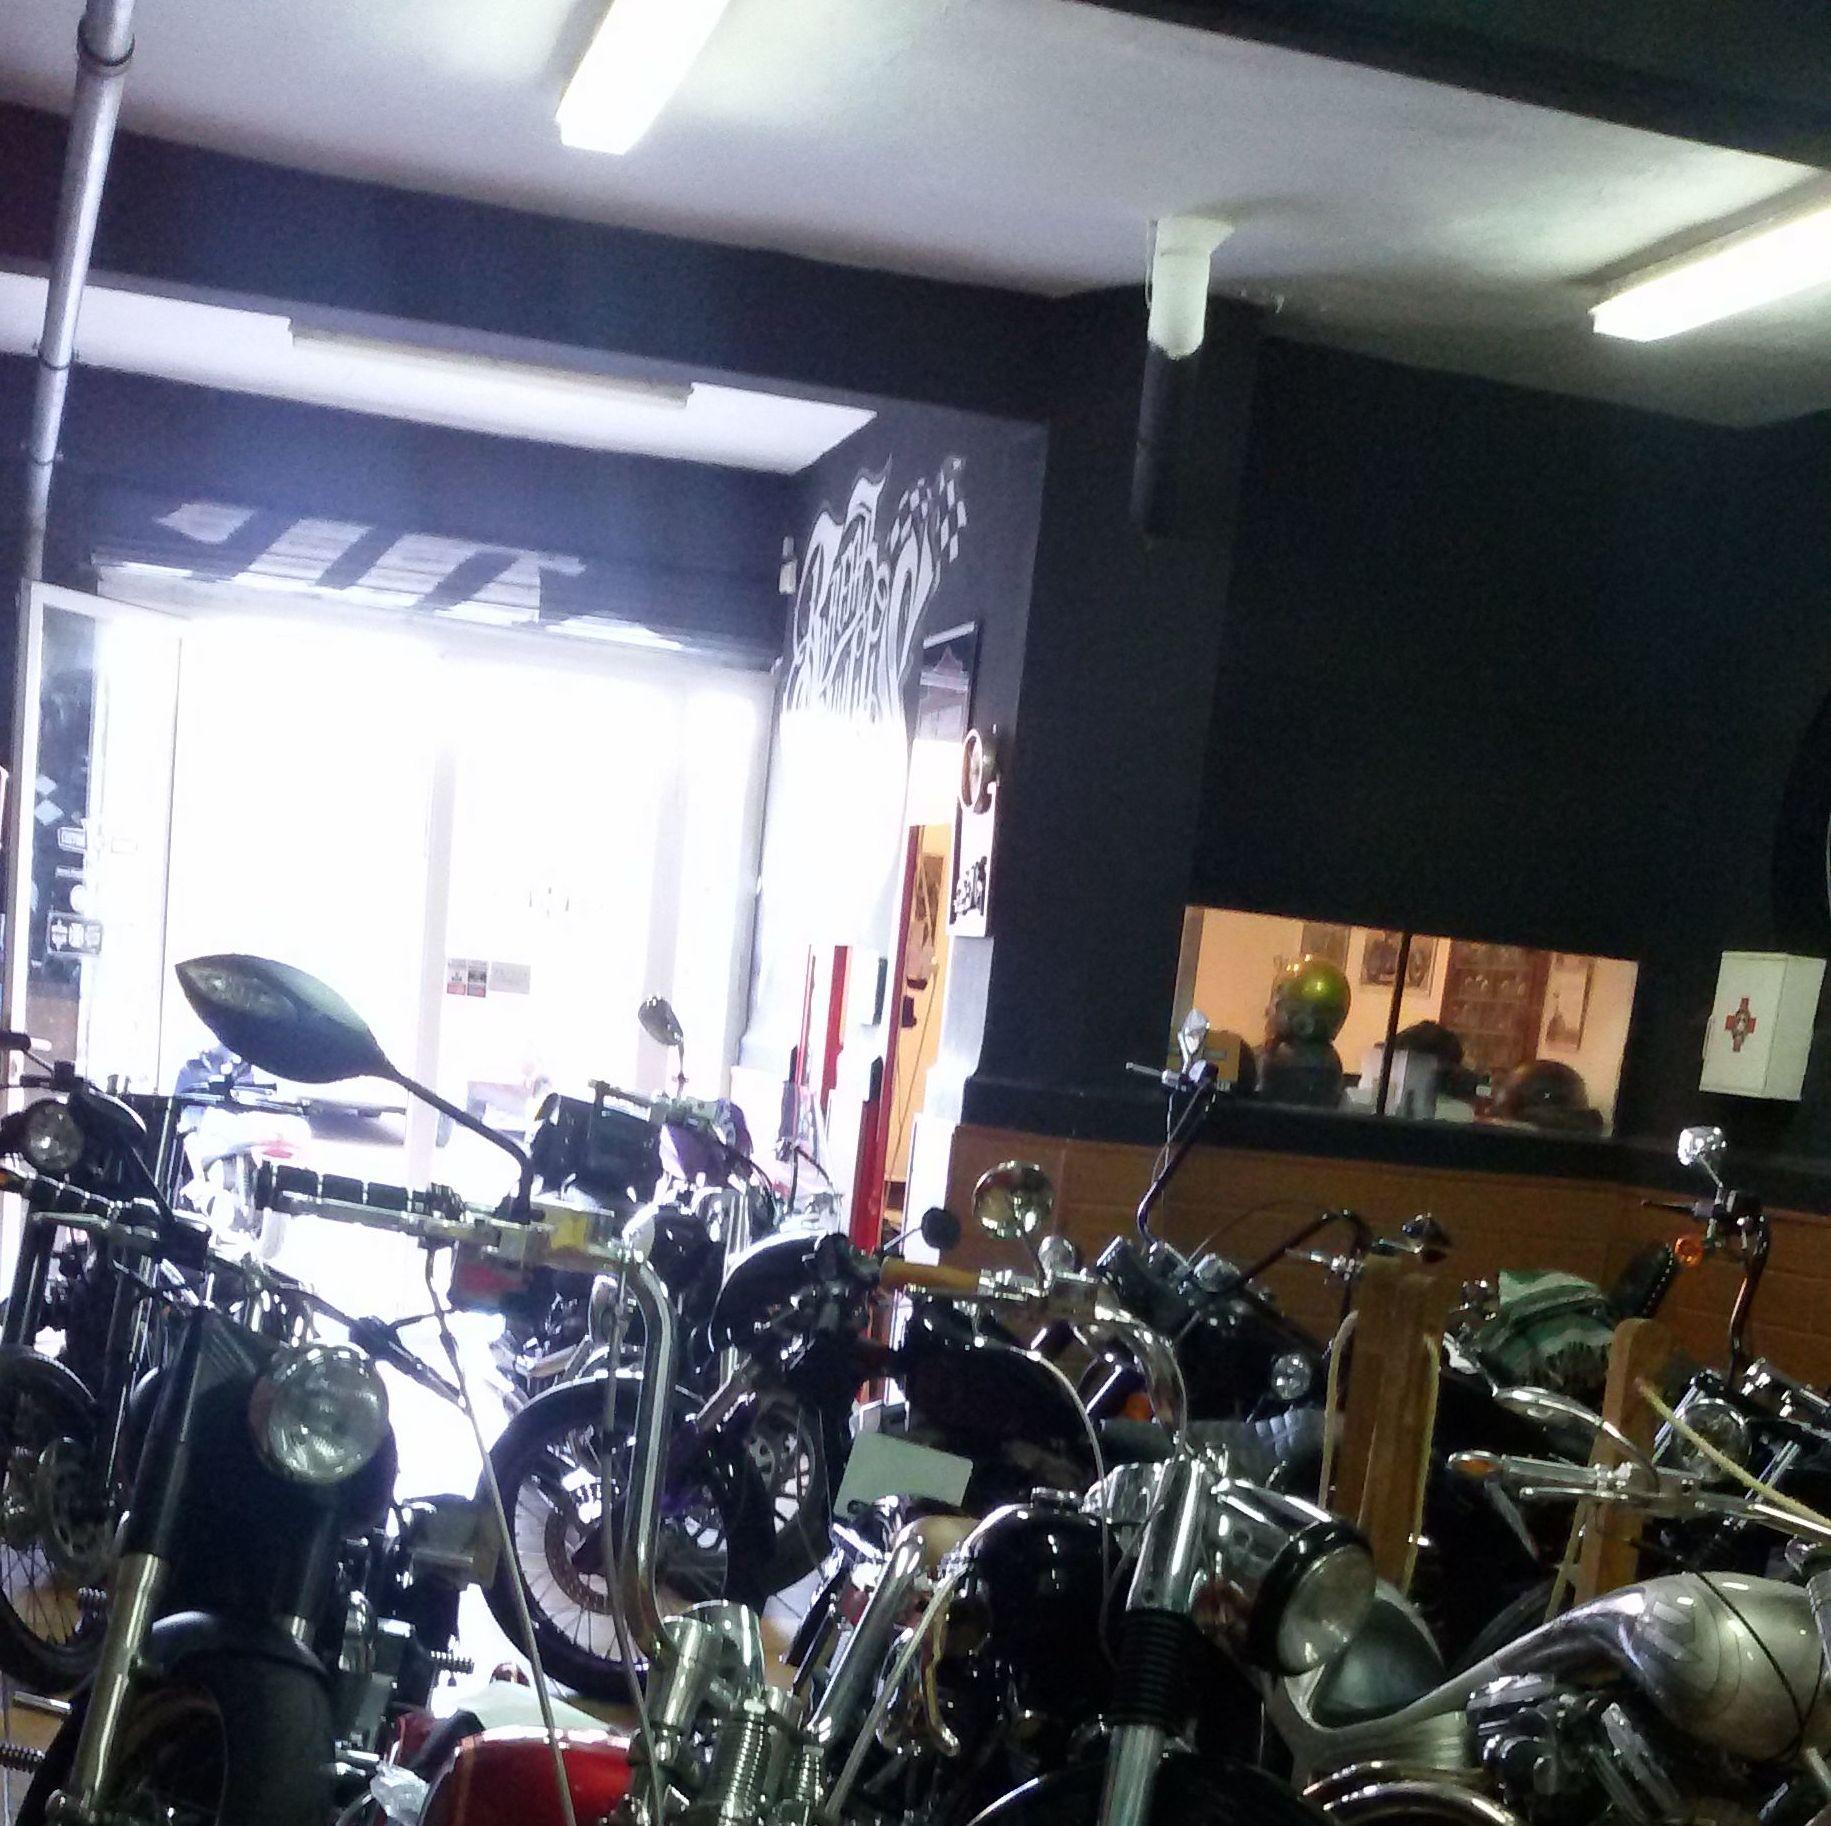 transformacion harley davidson, motos custom, venta harley davidson , customizar motos